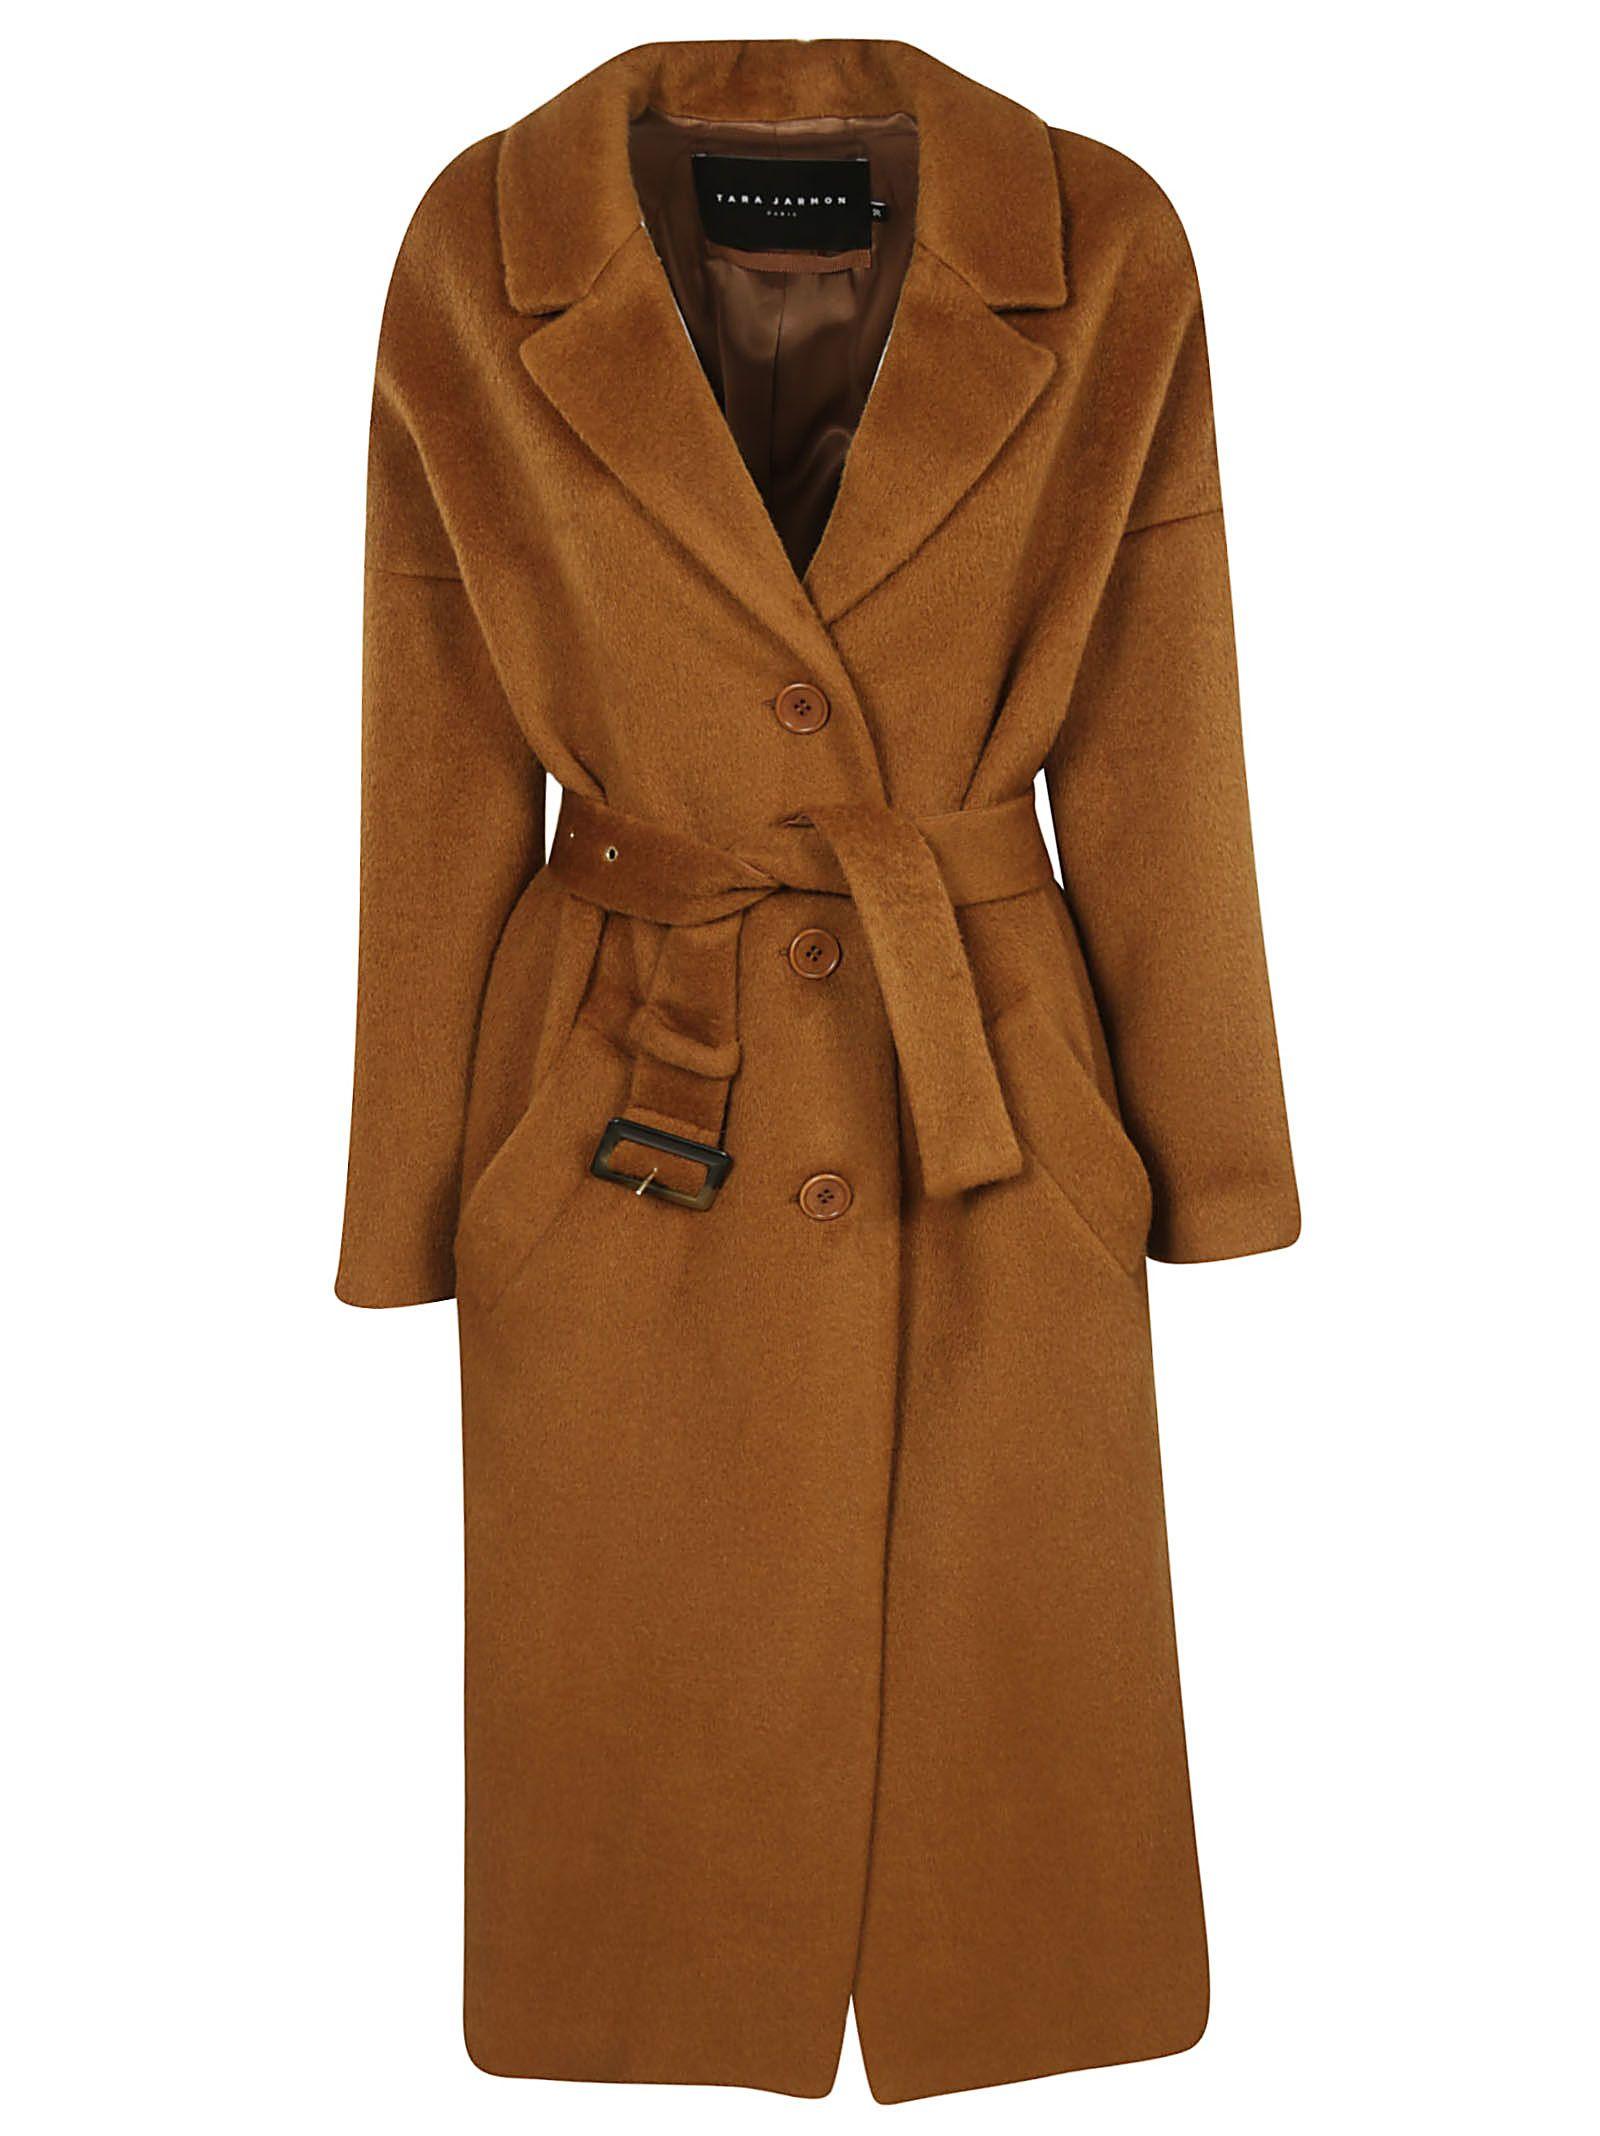 TARA JARMON Belted Coat in Noisette